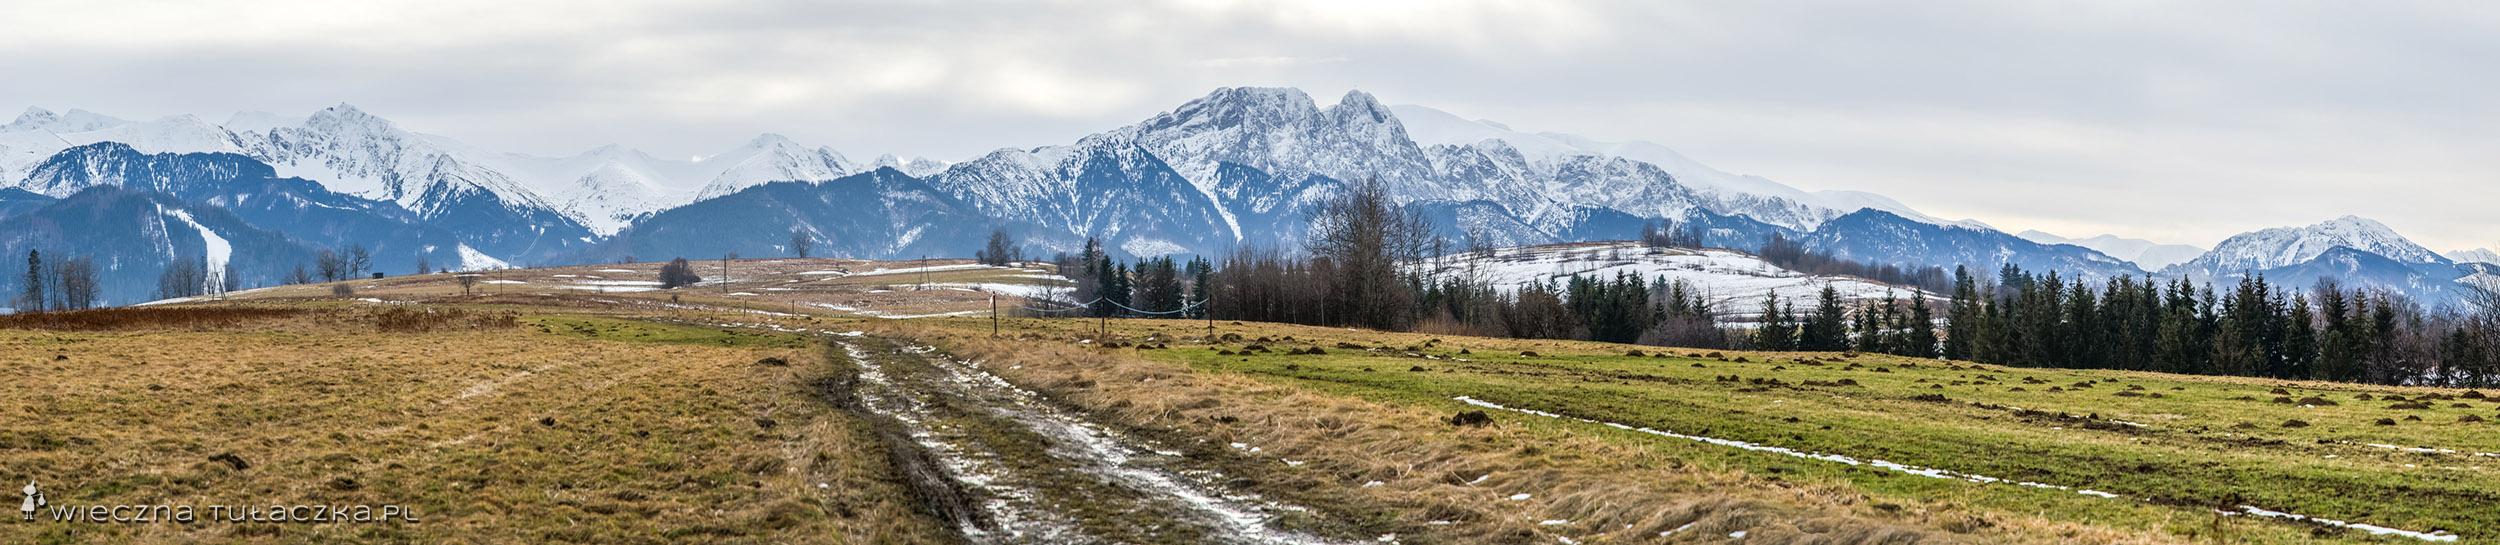 Bachledzki WIerch, Zakopane